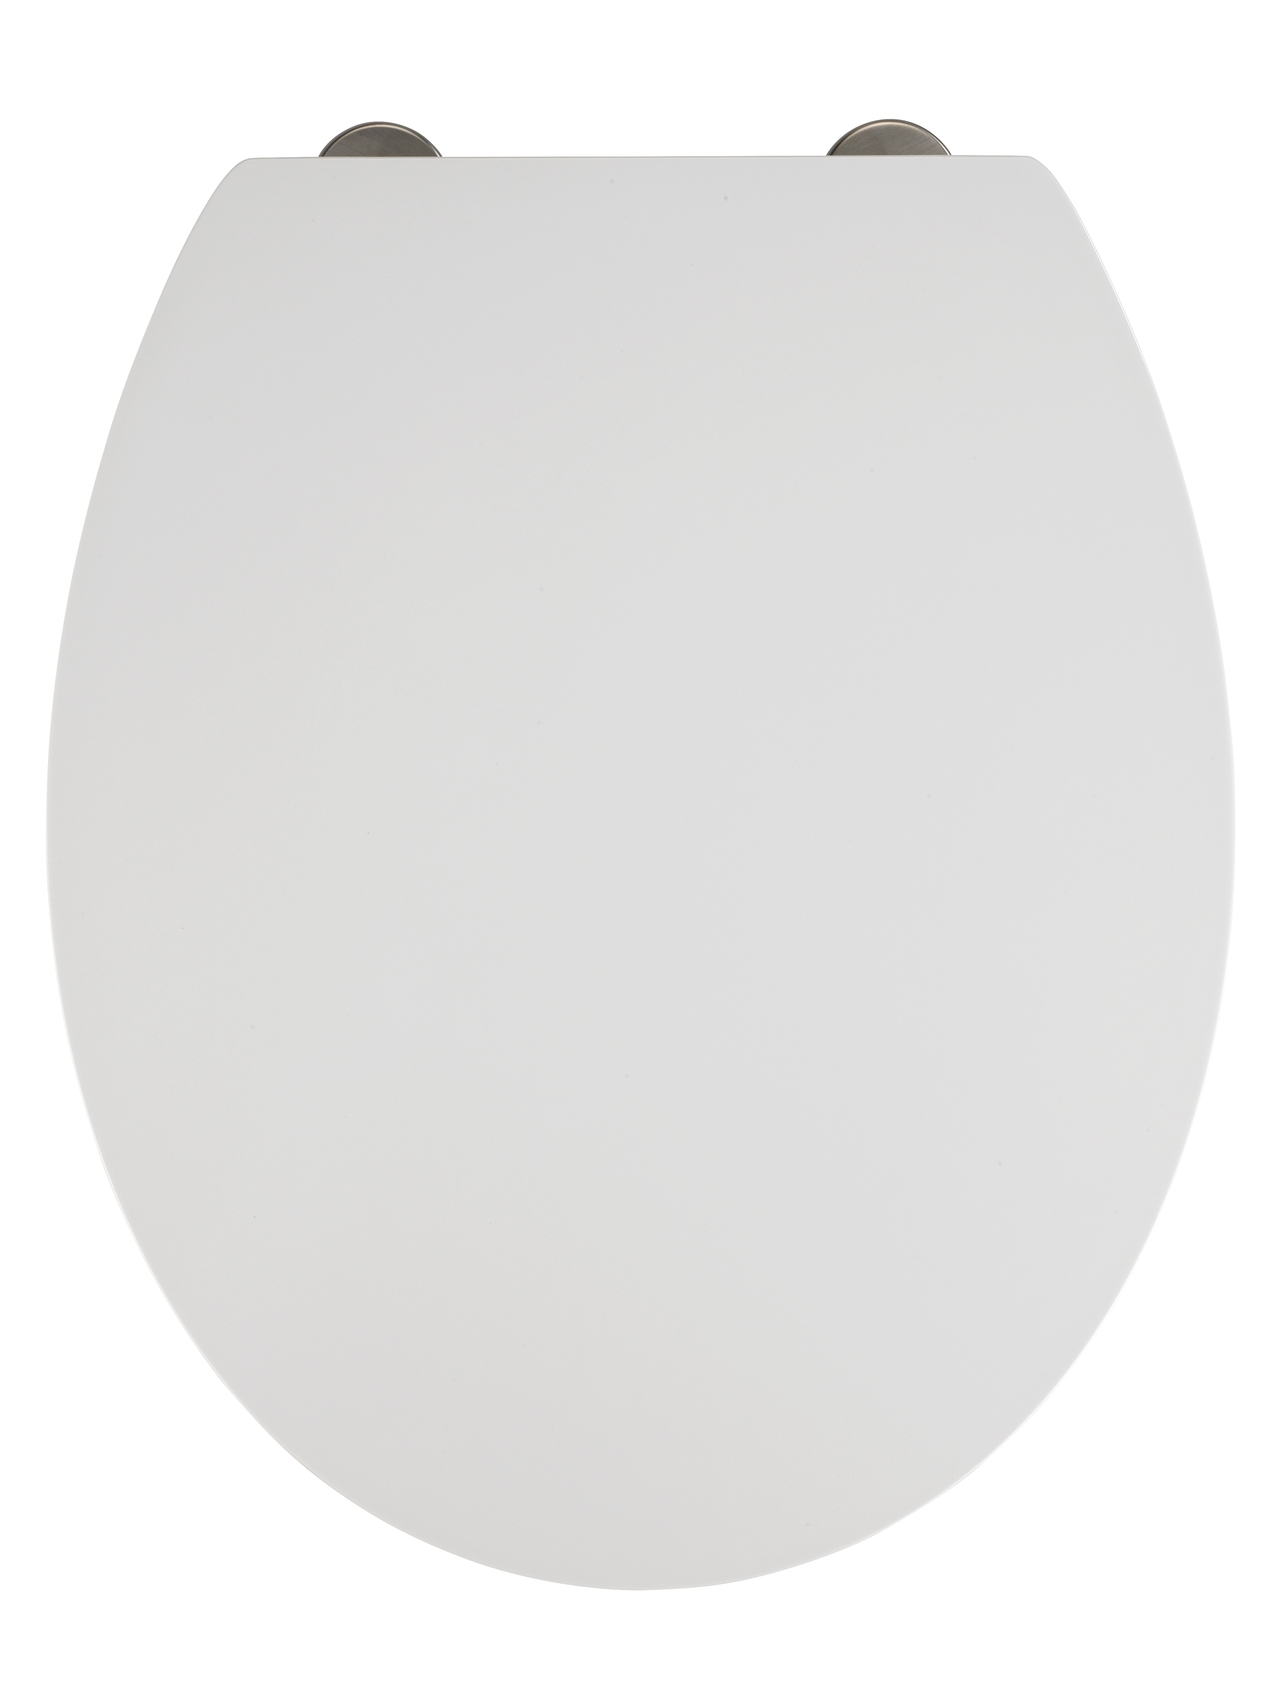 Capac toaleta din duroplast, cu spatiu pentru capsule parfumate, Mora Aroma Alb, l37xA44,5 cm somproduct.ro imagine 2021